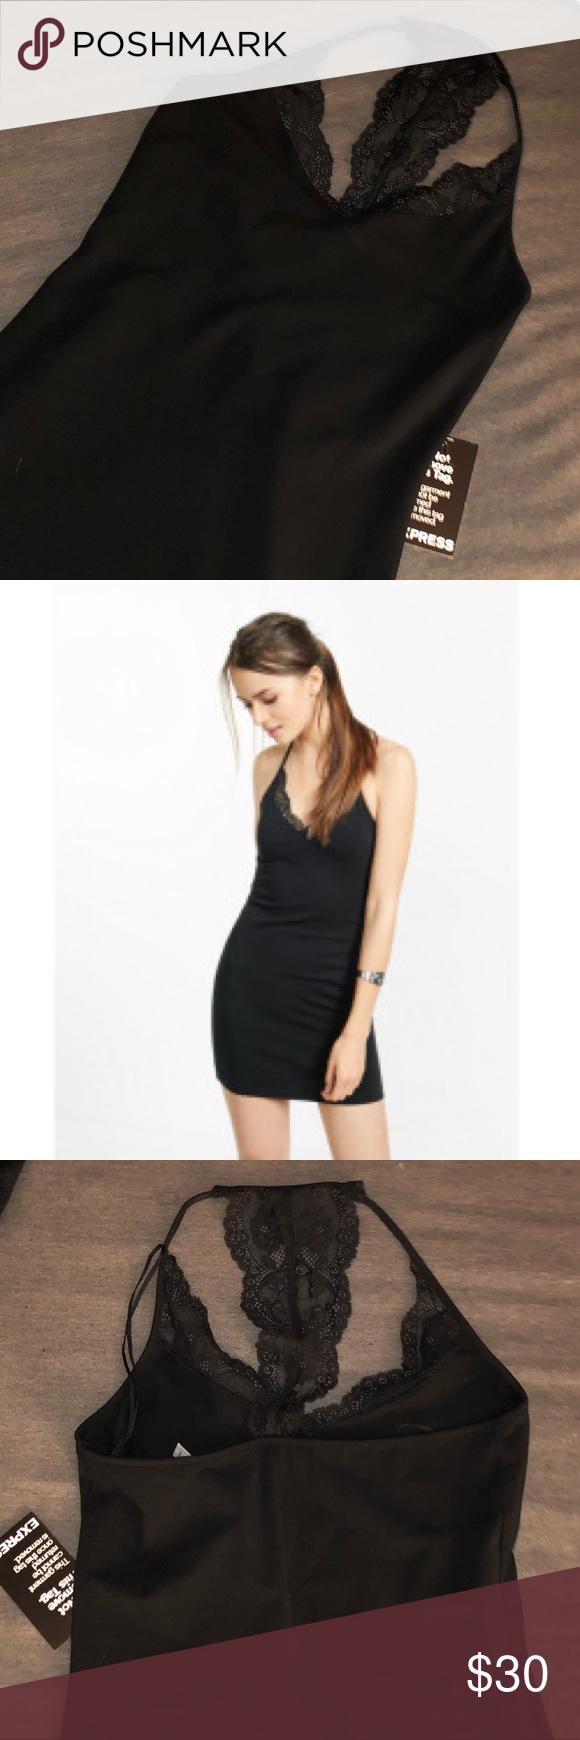 Brand new express little black dress nwt